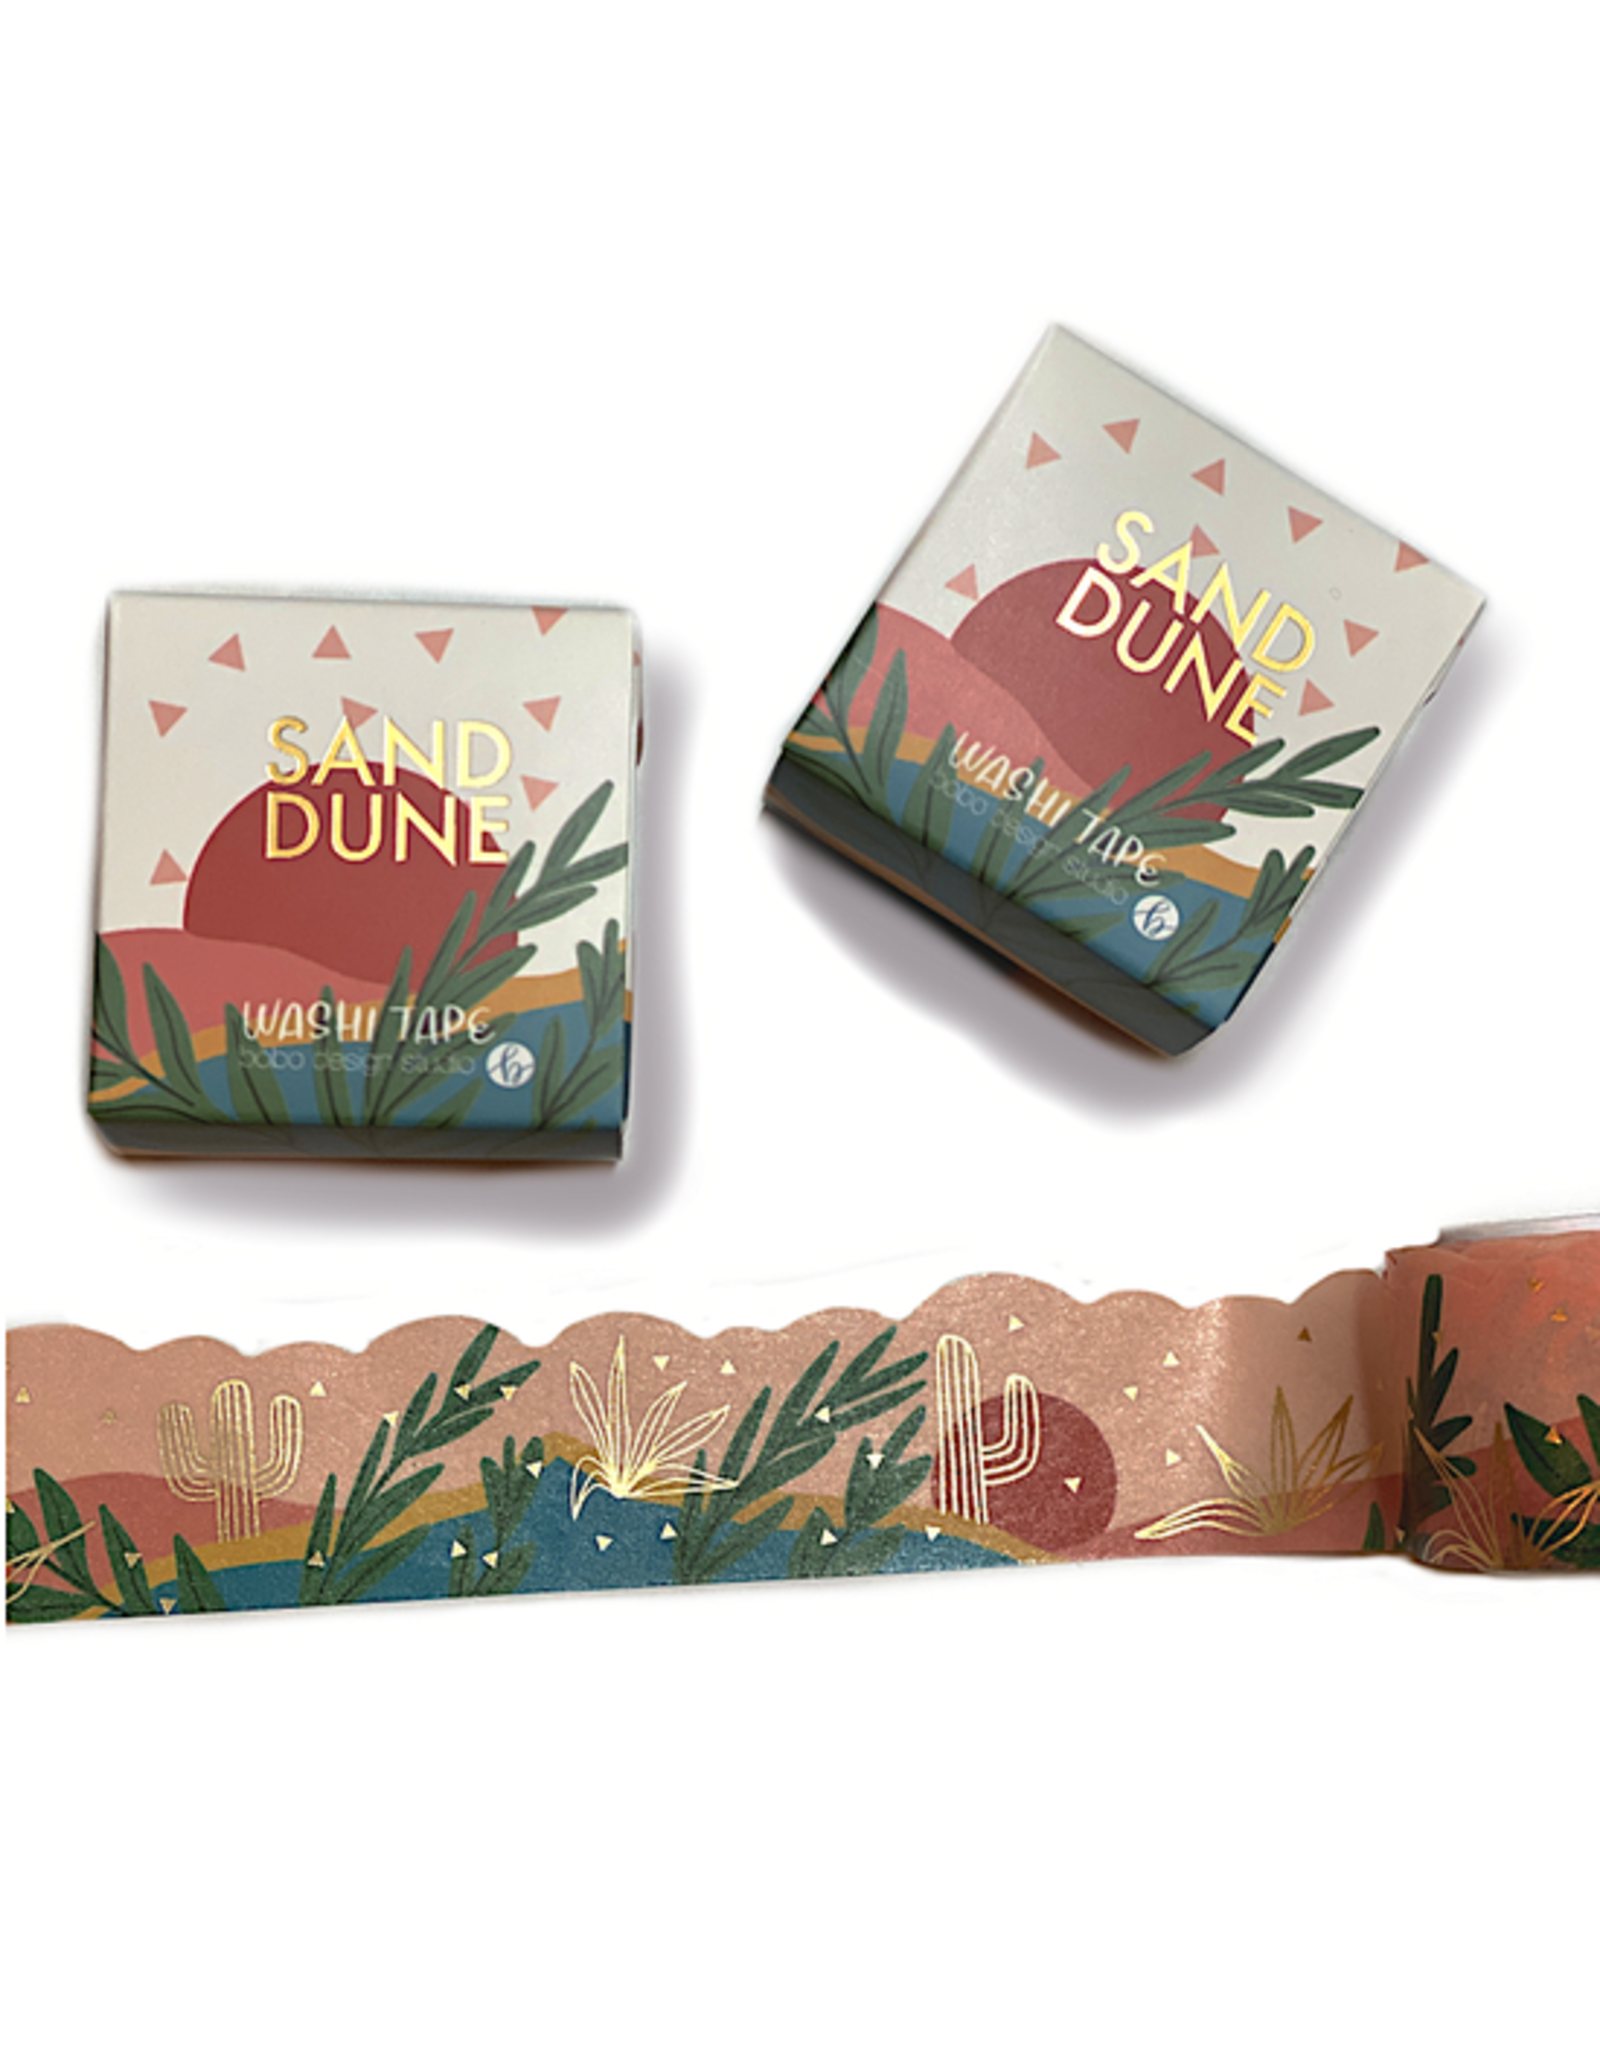 Bobo Design Studio Sand Dune - Gold Foil Cloud Cut Washi Tape